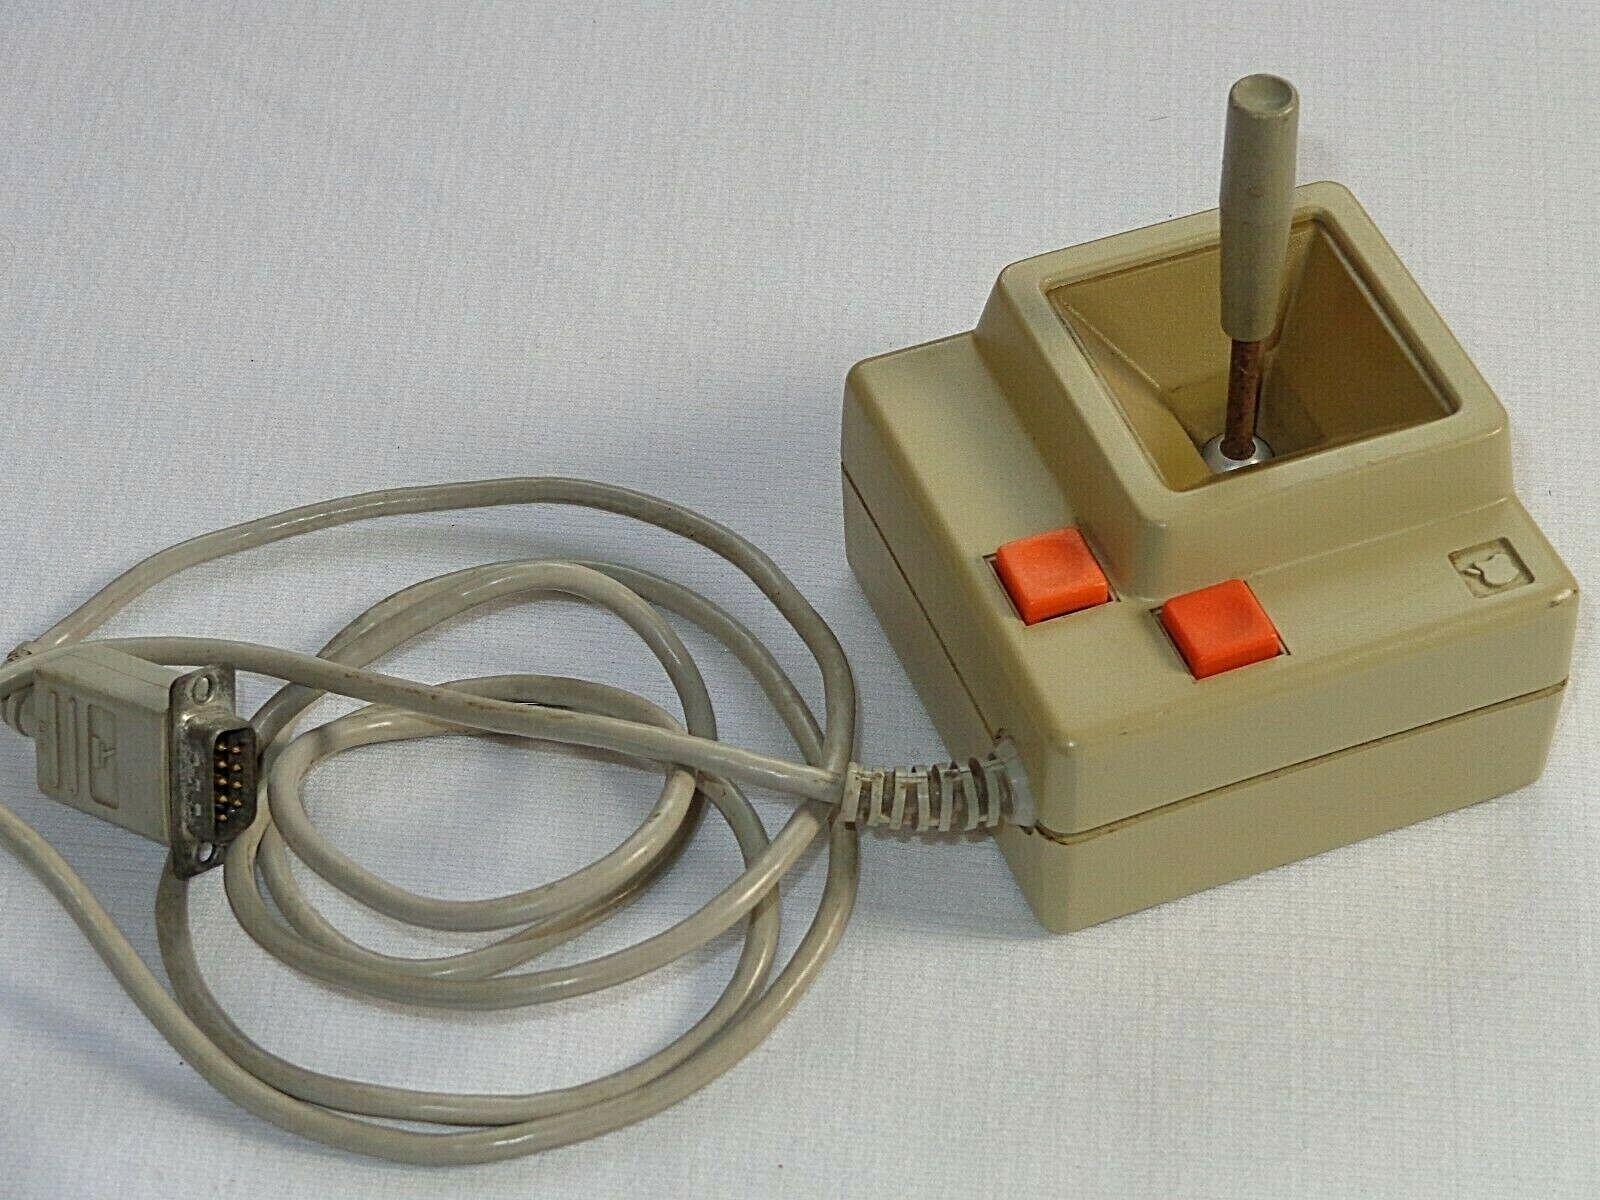 Vintage Apple IIC IIE Model 2M2002 Joystick - $61.00